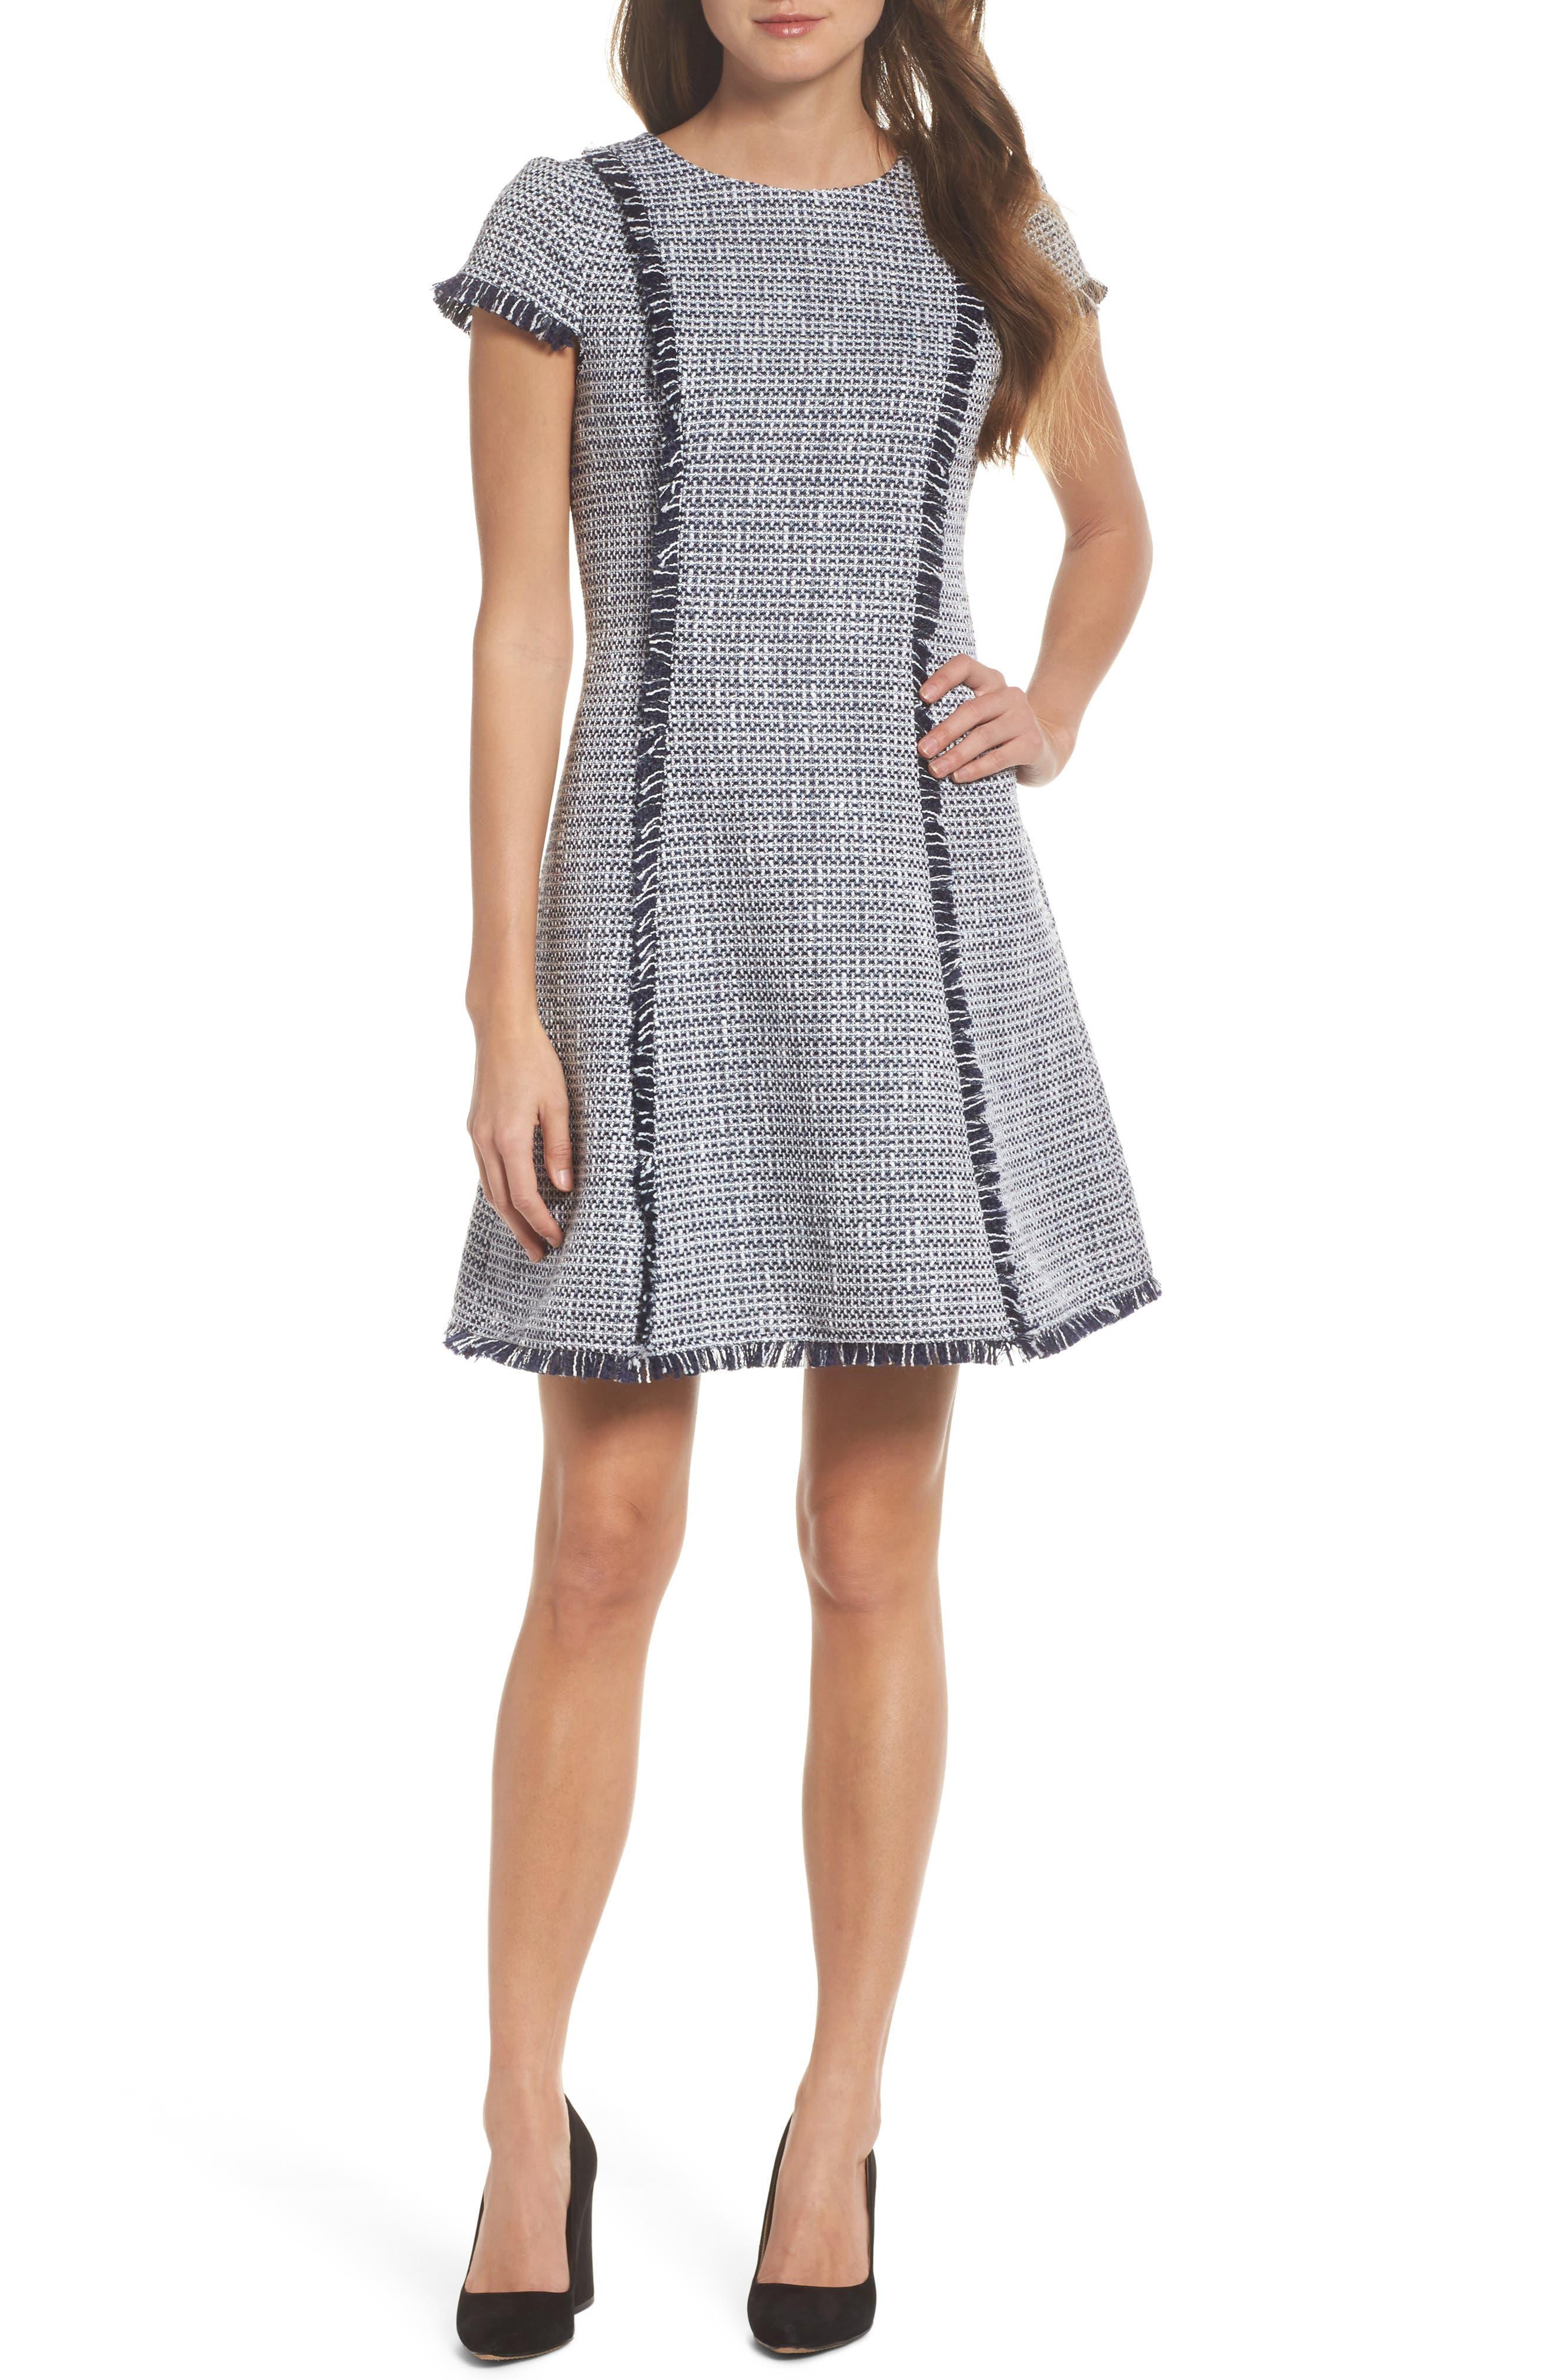 Alternate Image 1 Selected - Eliza J Tweed Fit & Flare Dress